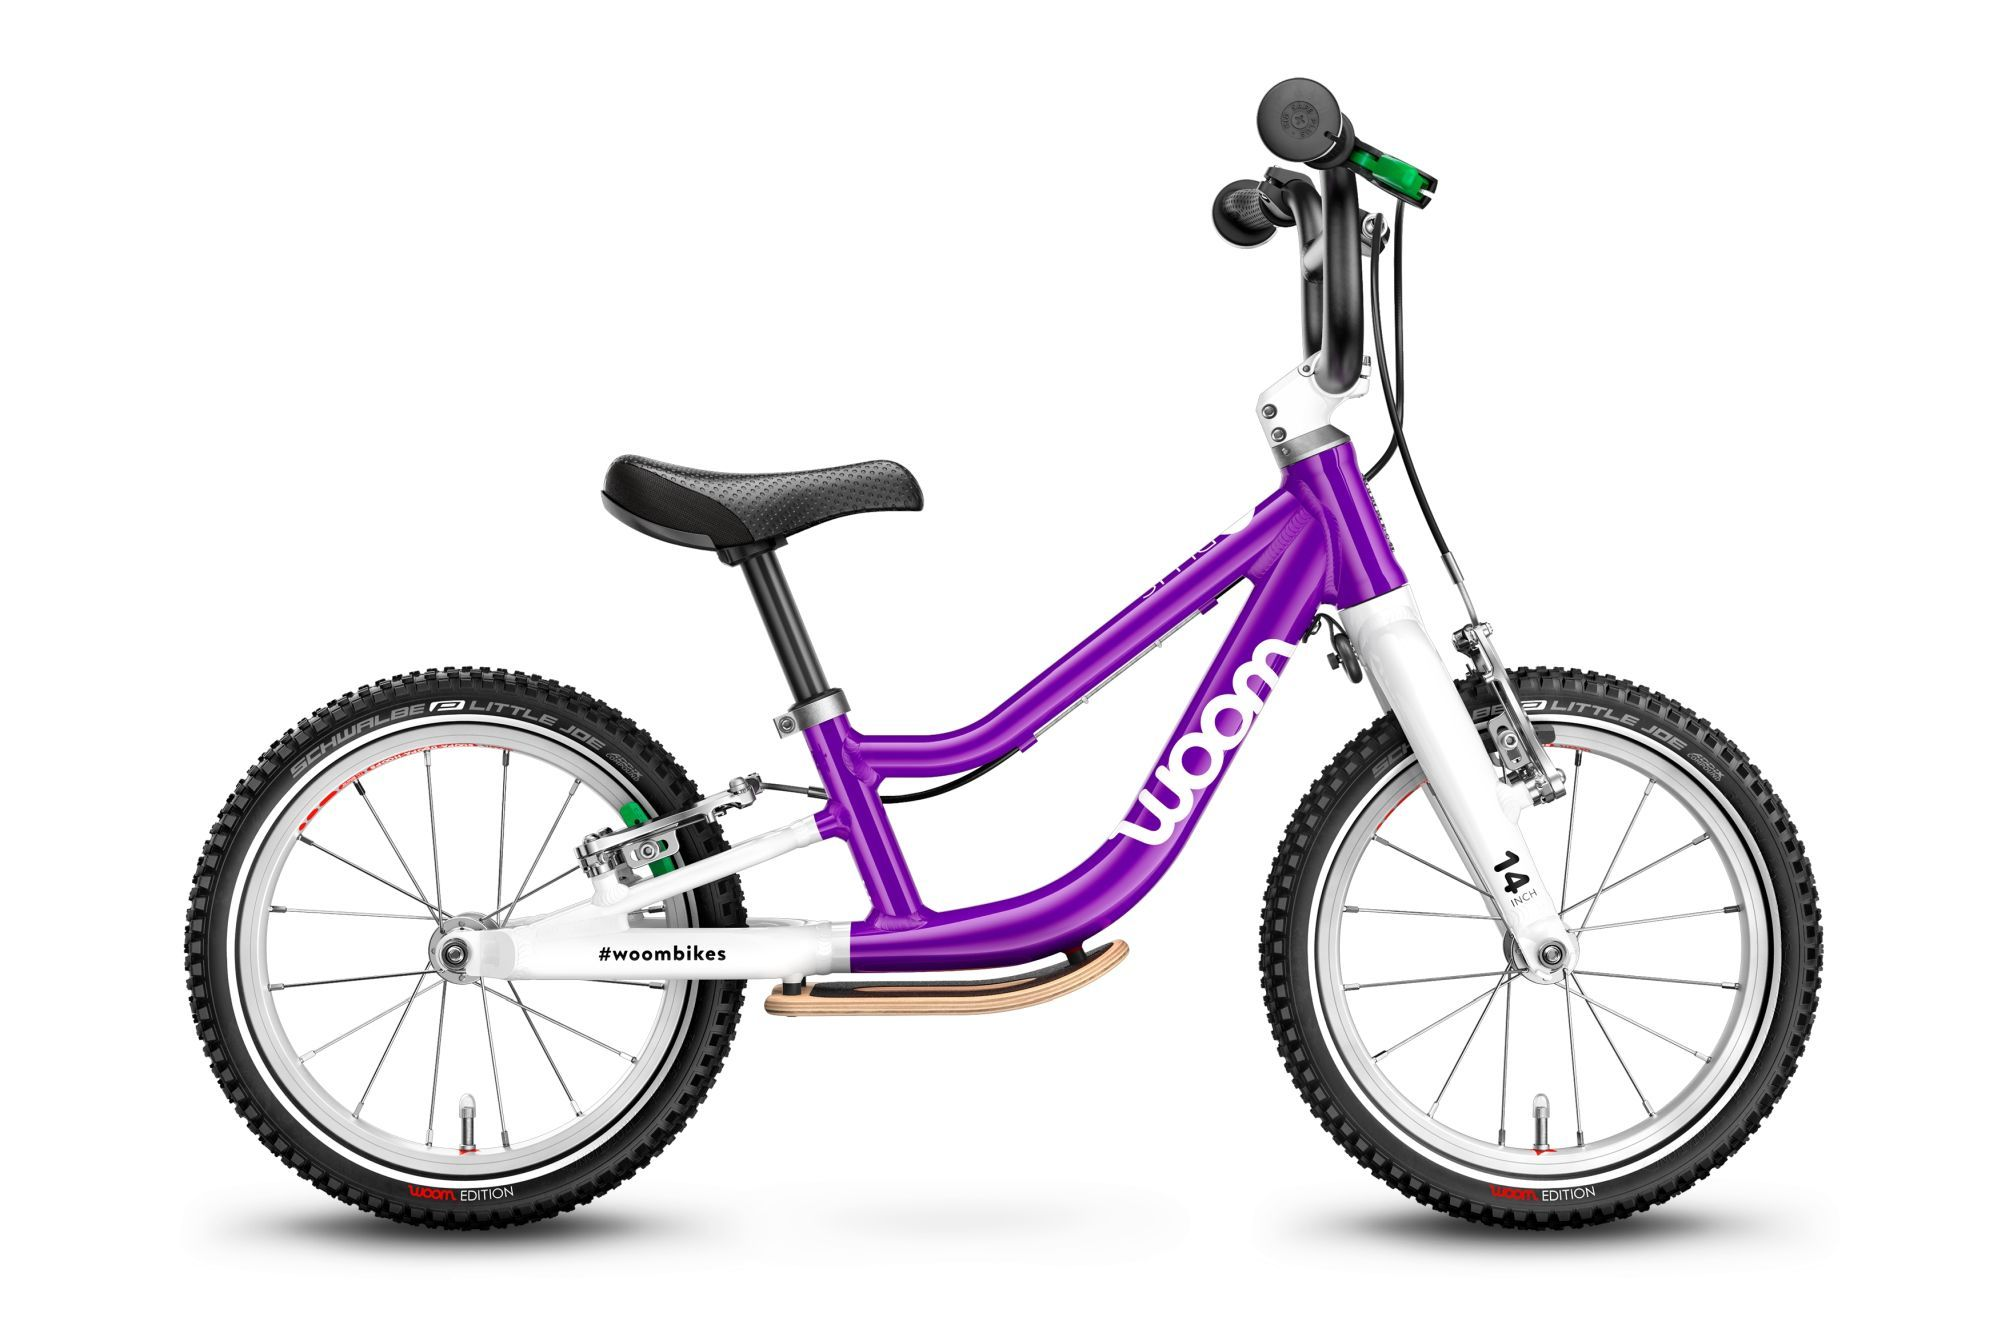 kinderfahrzeuge & laufräder: Diamant Woom 1 PLUS 1 Gang Kinderlaufrad Diamant Modell 2021 14 Zoll